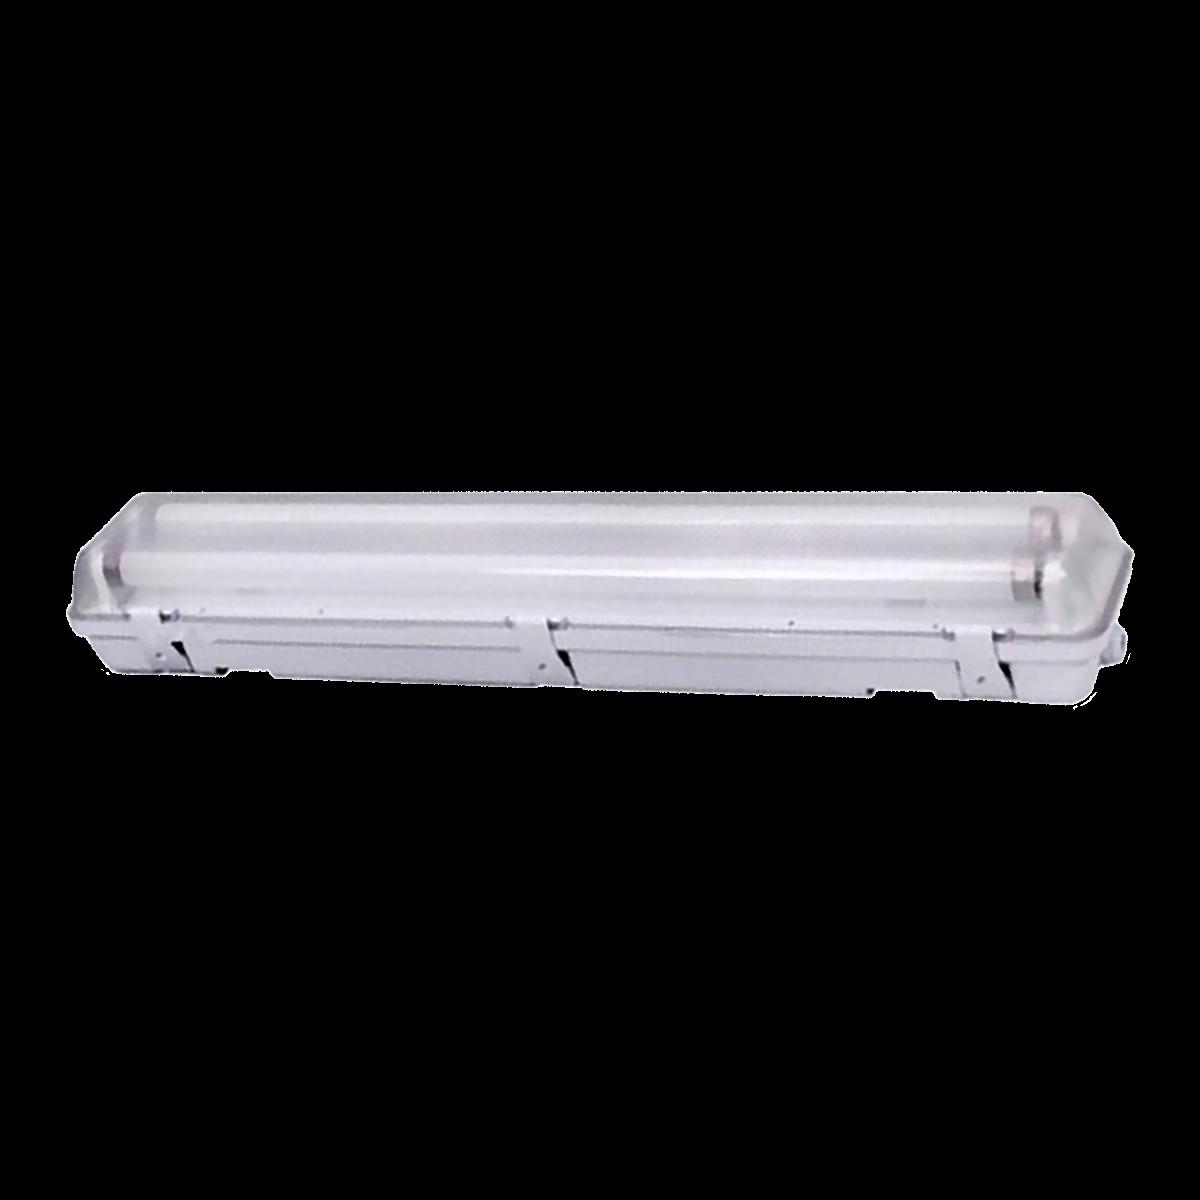 Silamp LED Batten 120cm